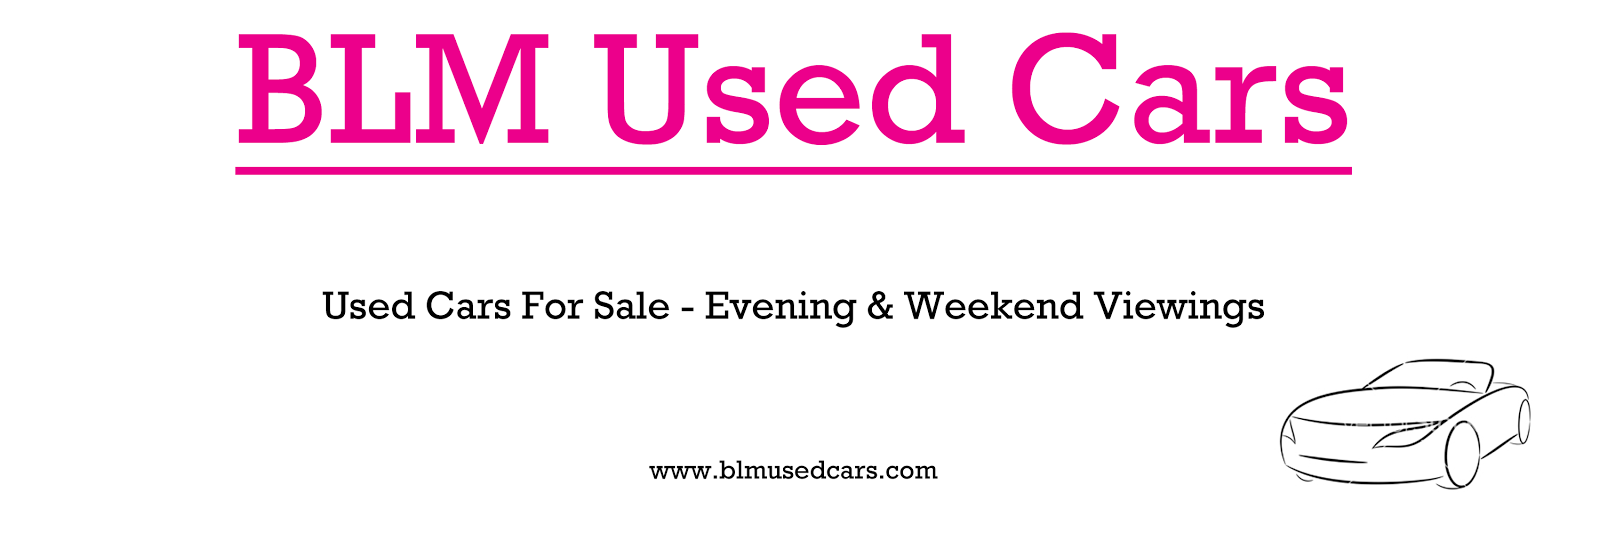 Used Car Sales Aylesbury - BLM Used Cars - Used Cars For Sale Aylesbury, Buckinghamshire